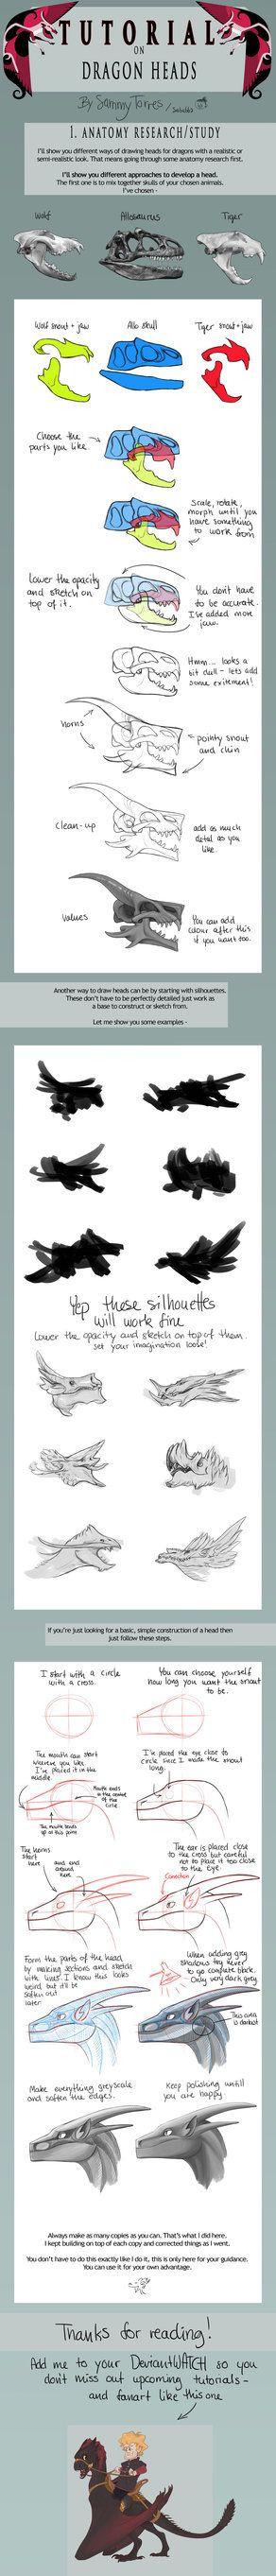 TUTORIAL: Dragon Heads by SammyTorres.deviantart.com on @DeviantArt